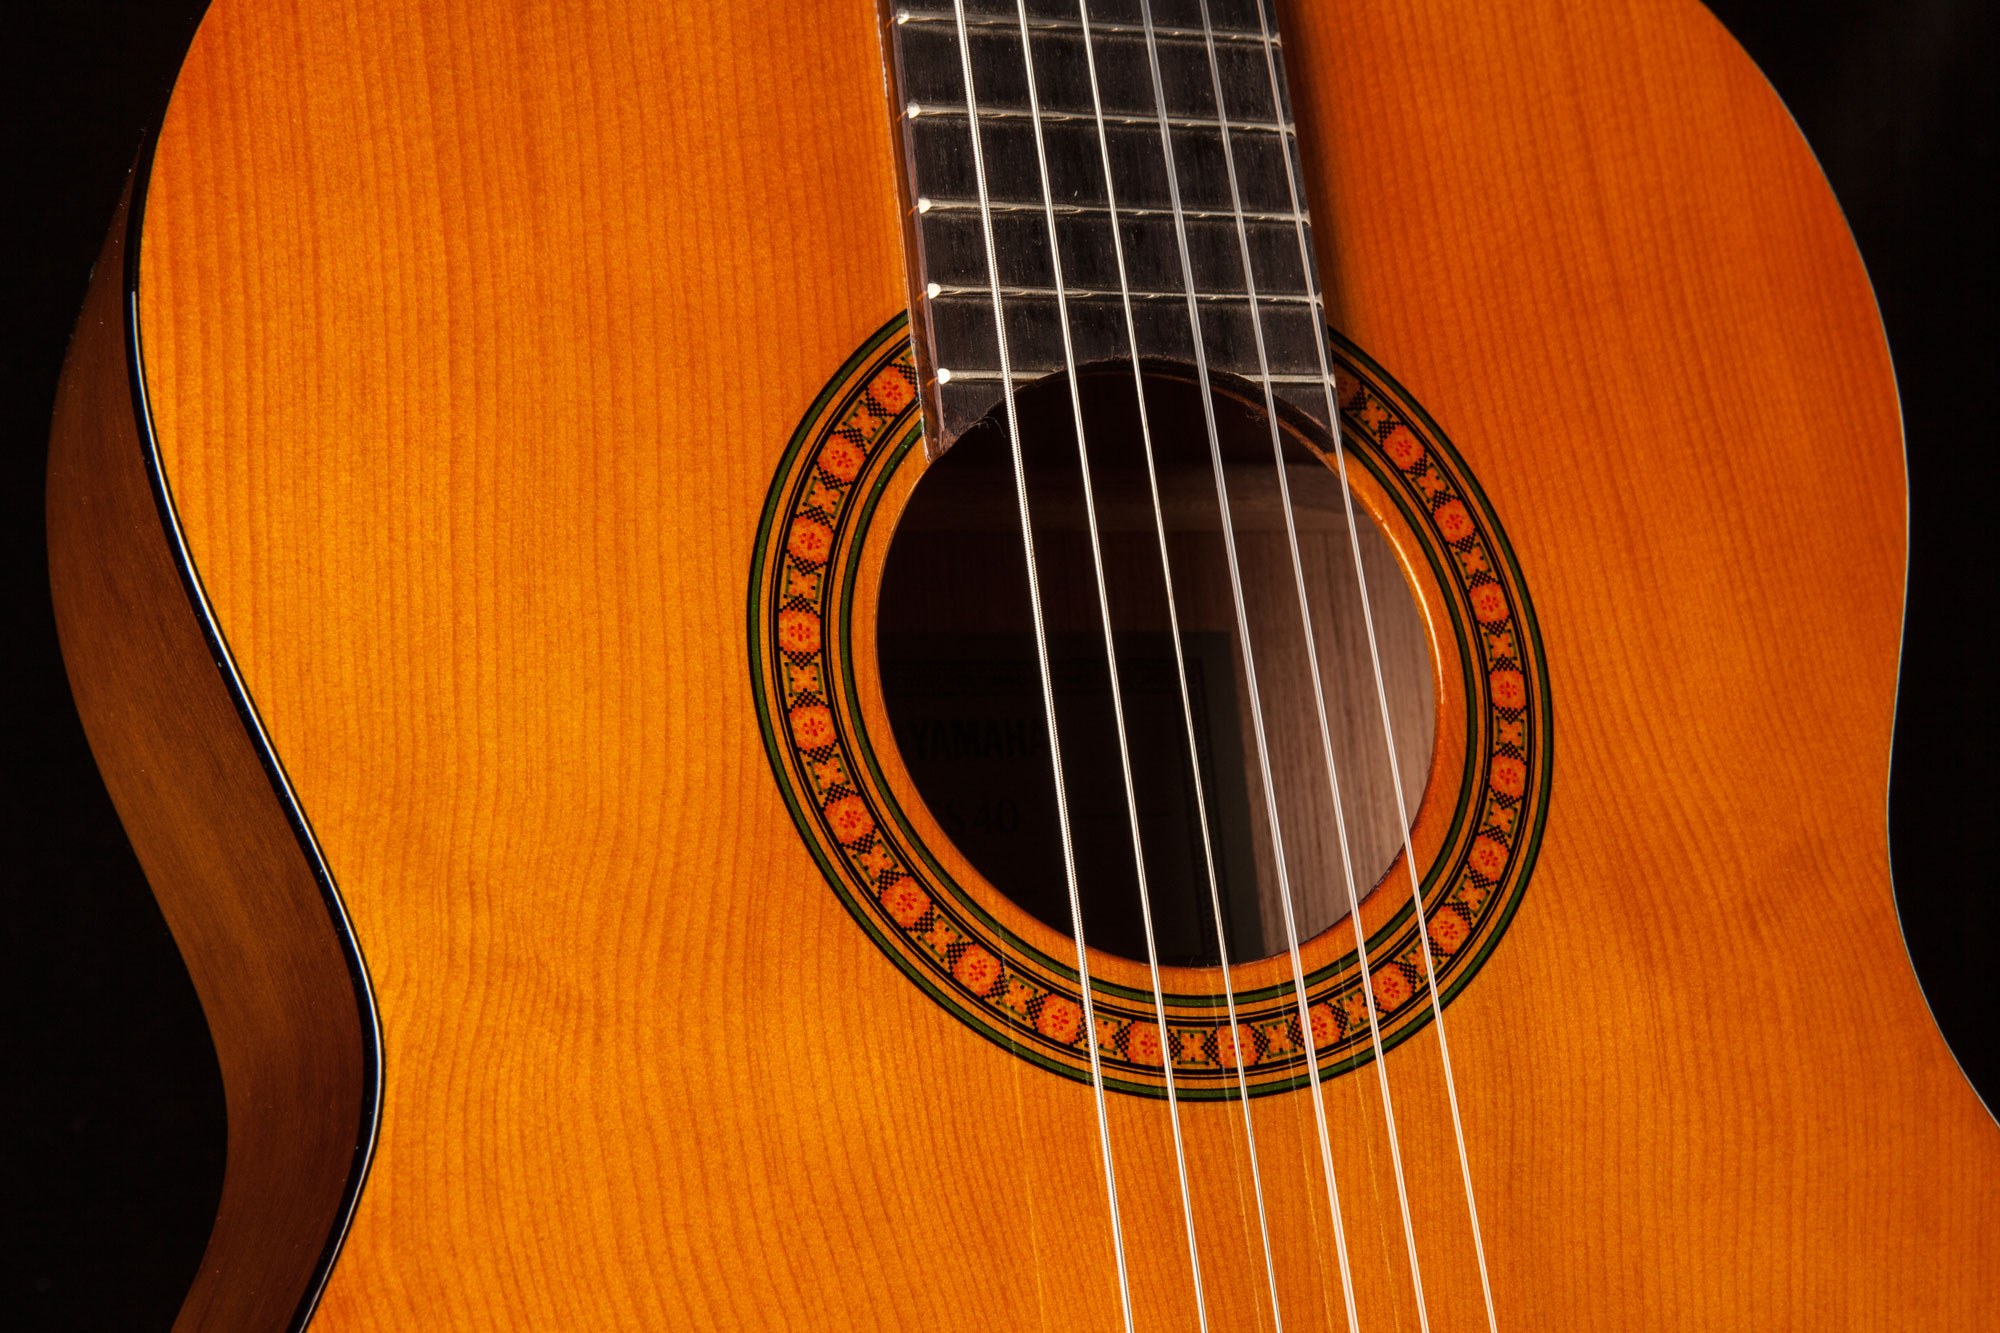 yamaha cs40 mk ii three quarter size classical guitar in natural finish yamaha music london. Black Bedroom Furniture Sets. Home Design Ideas